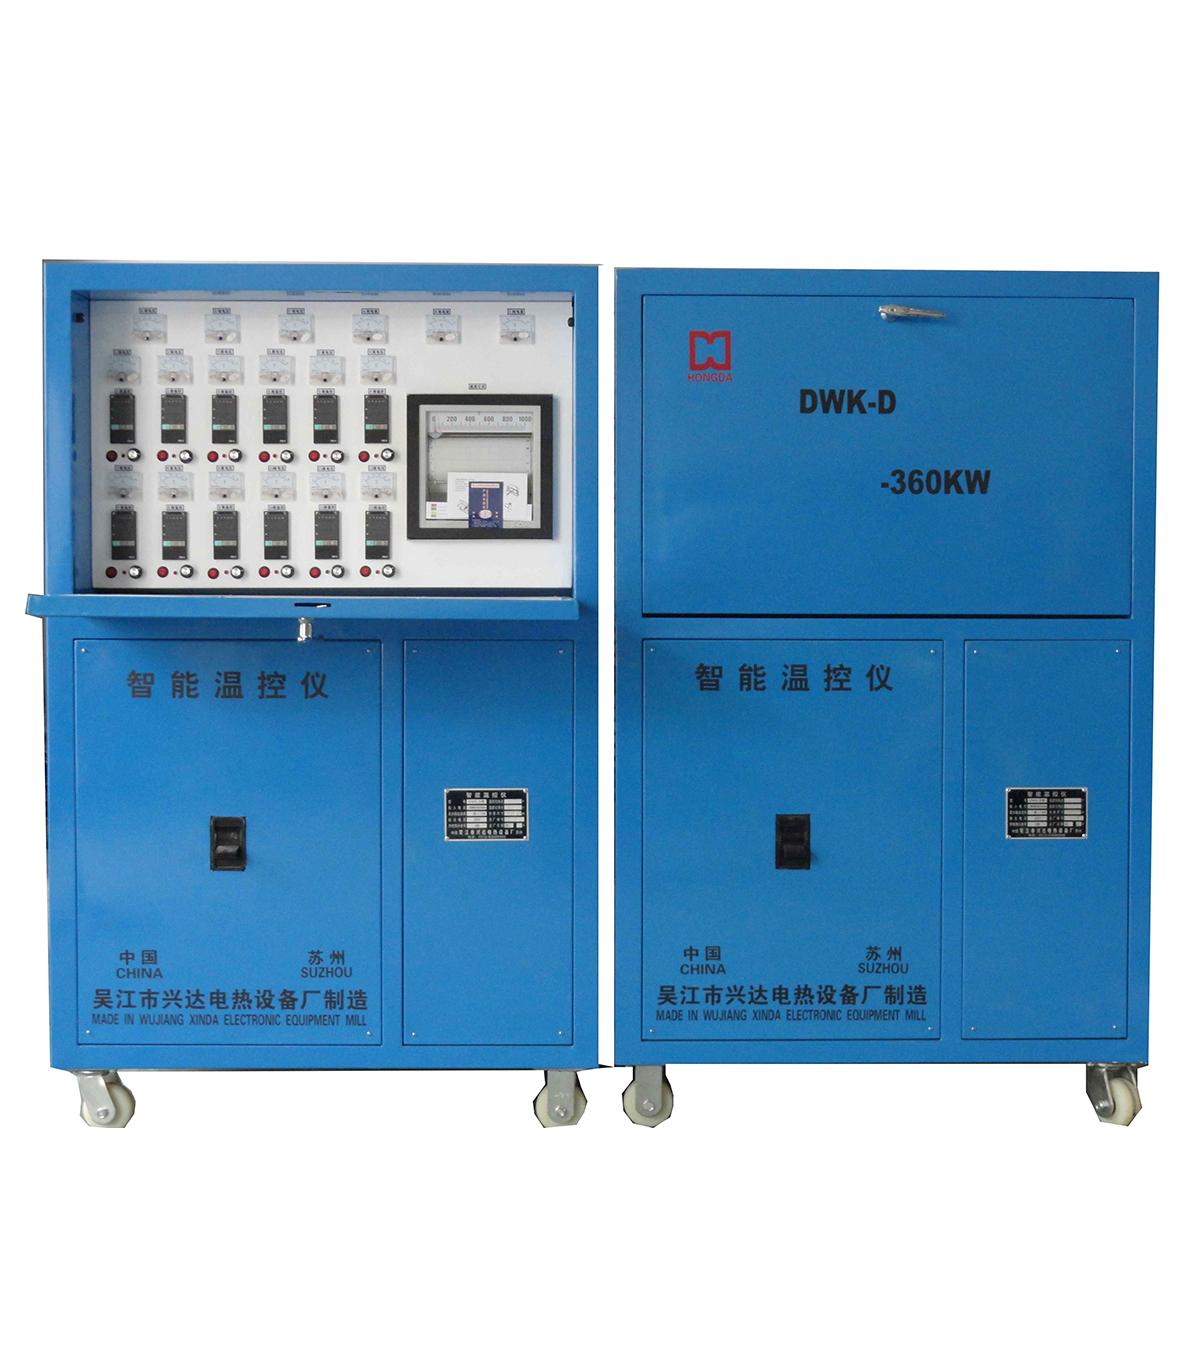 DWK-D-360KW型智能温控仪